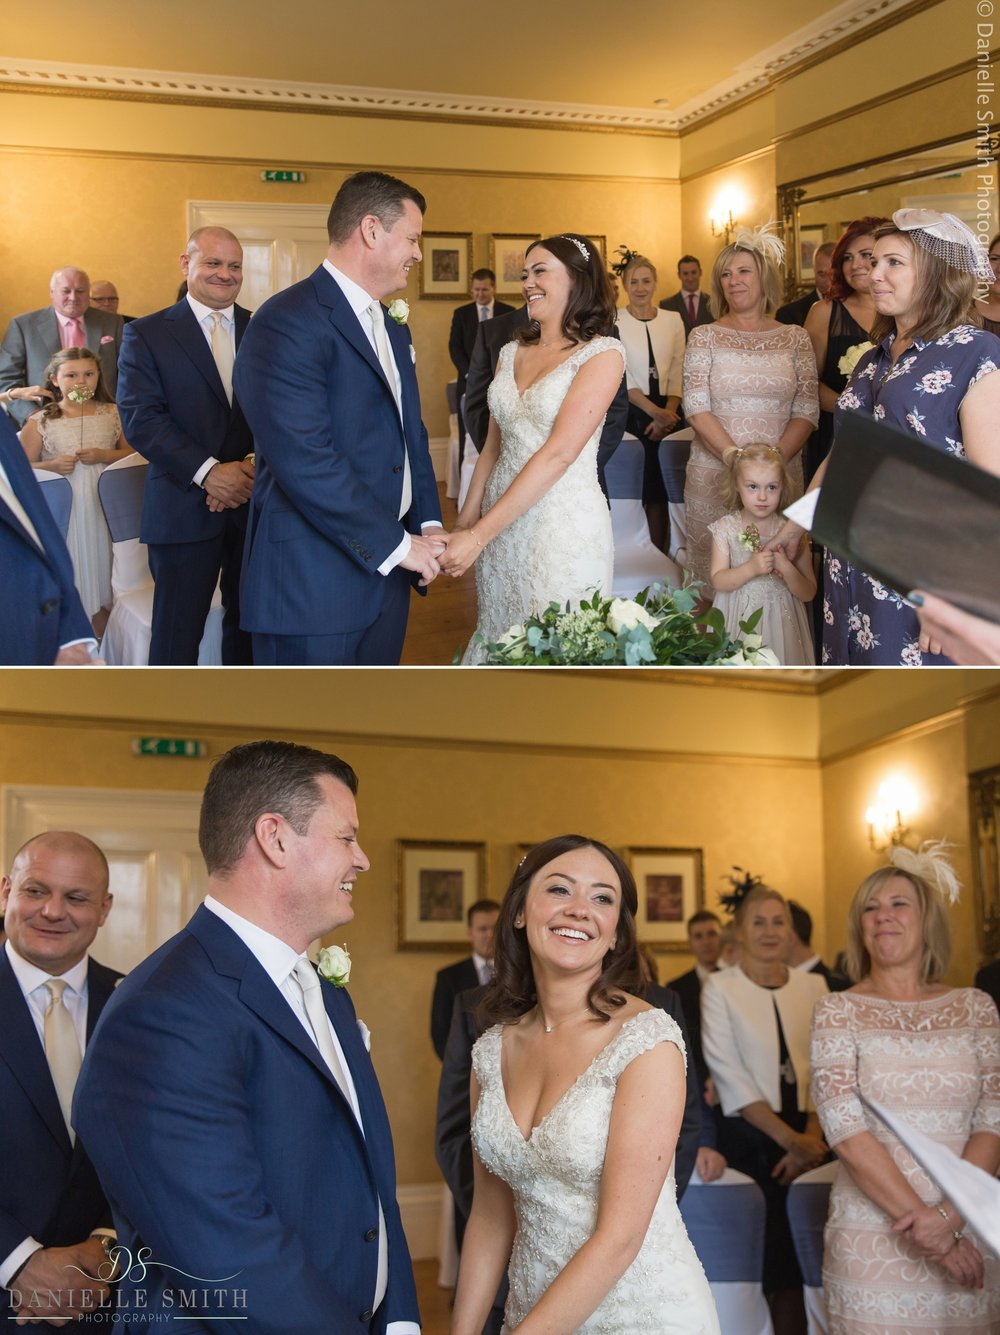 bride and groom getting married - fennes intimate wedding